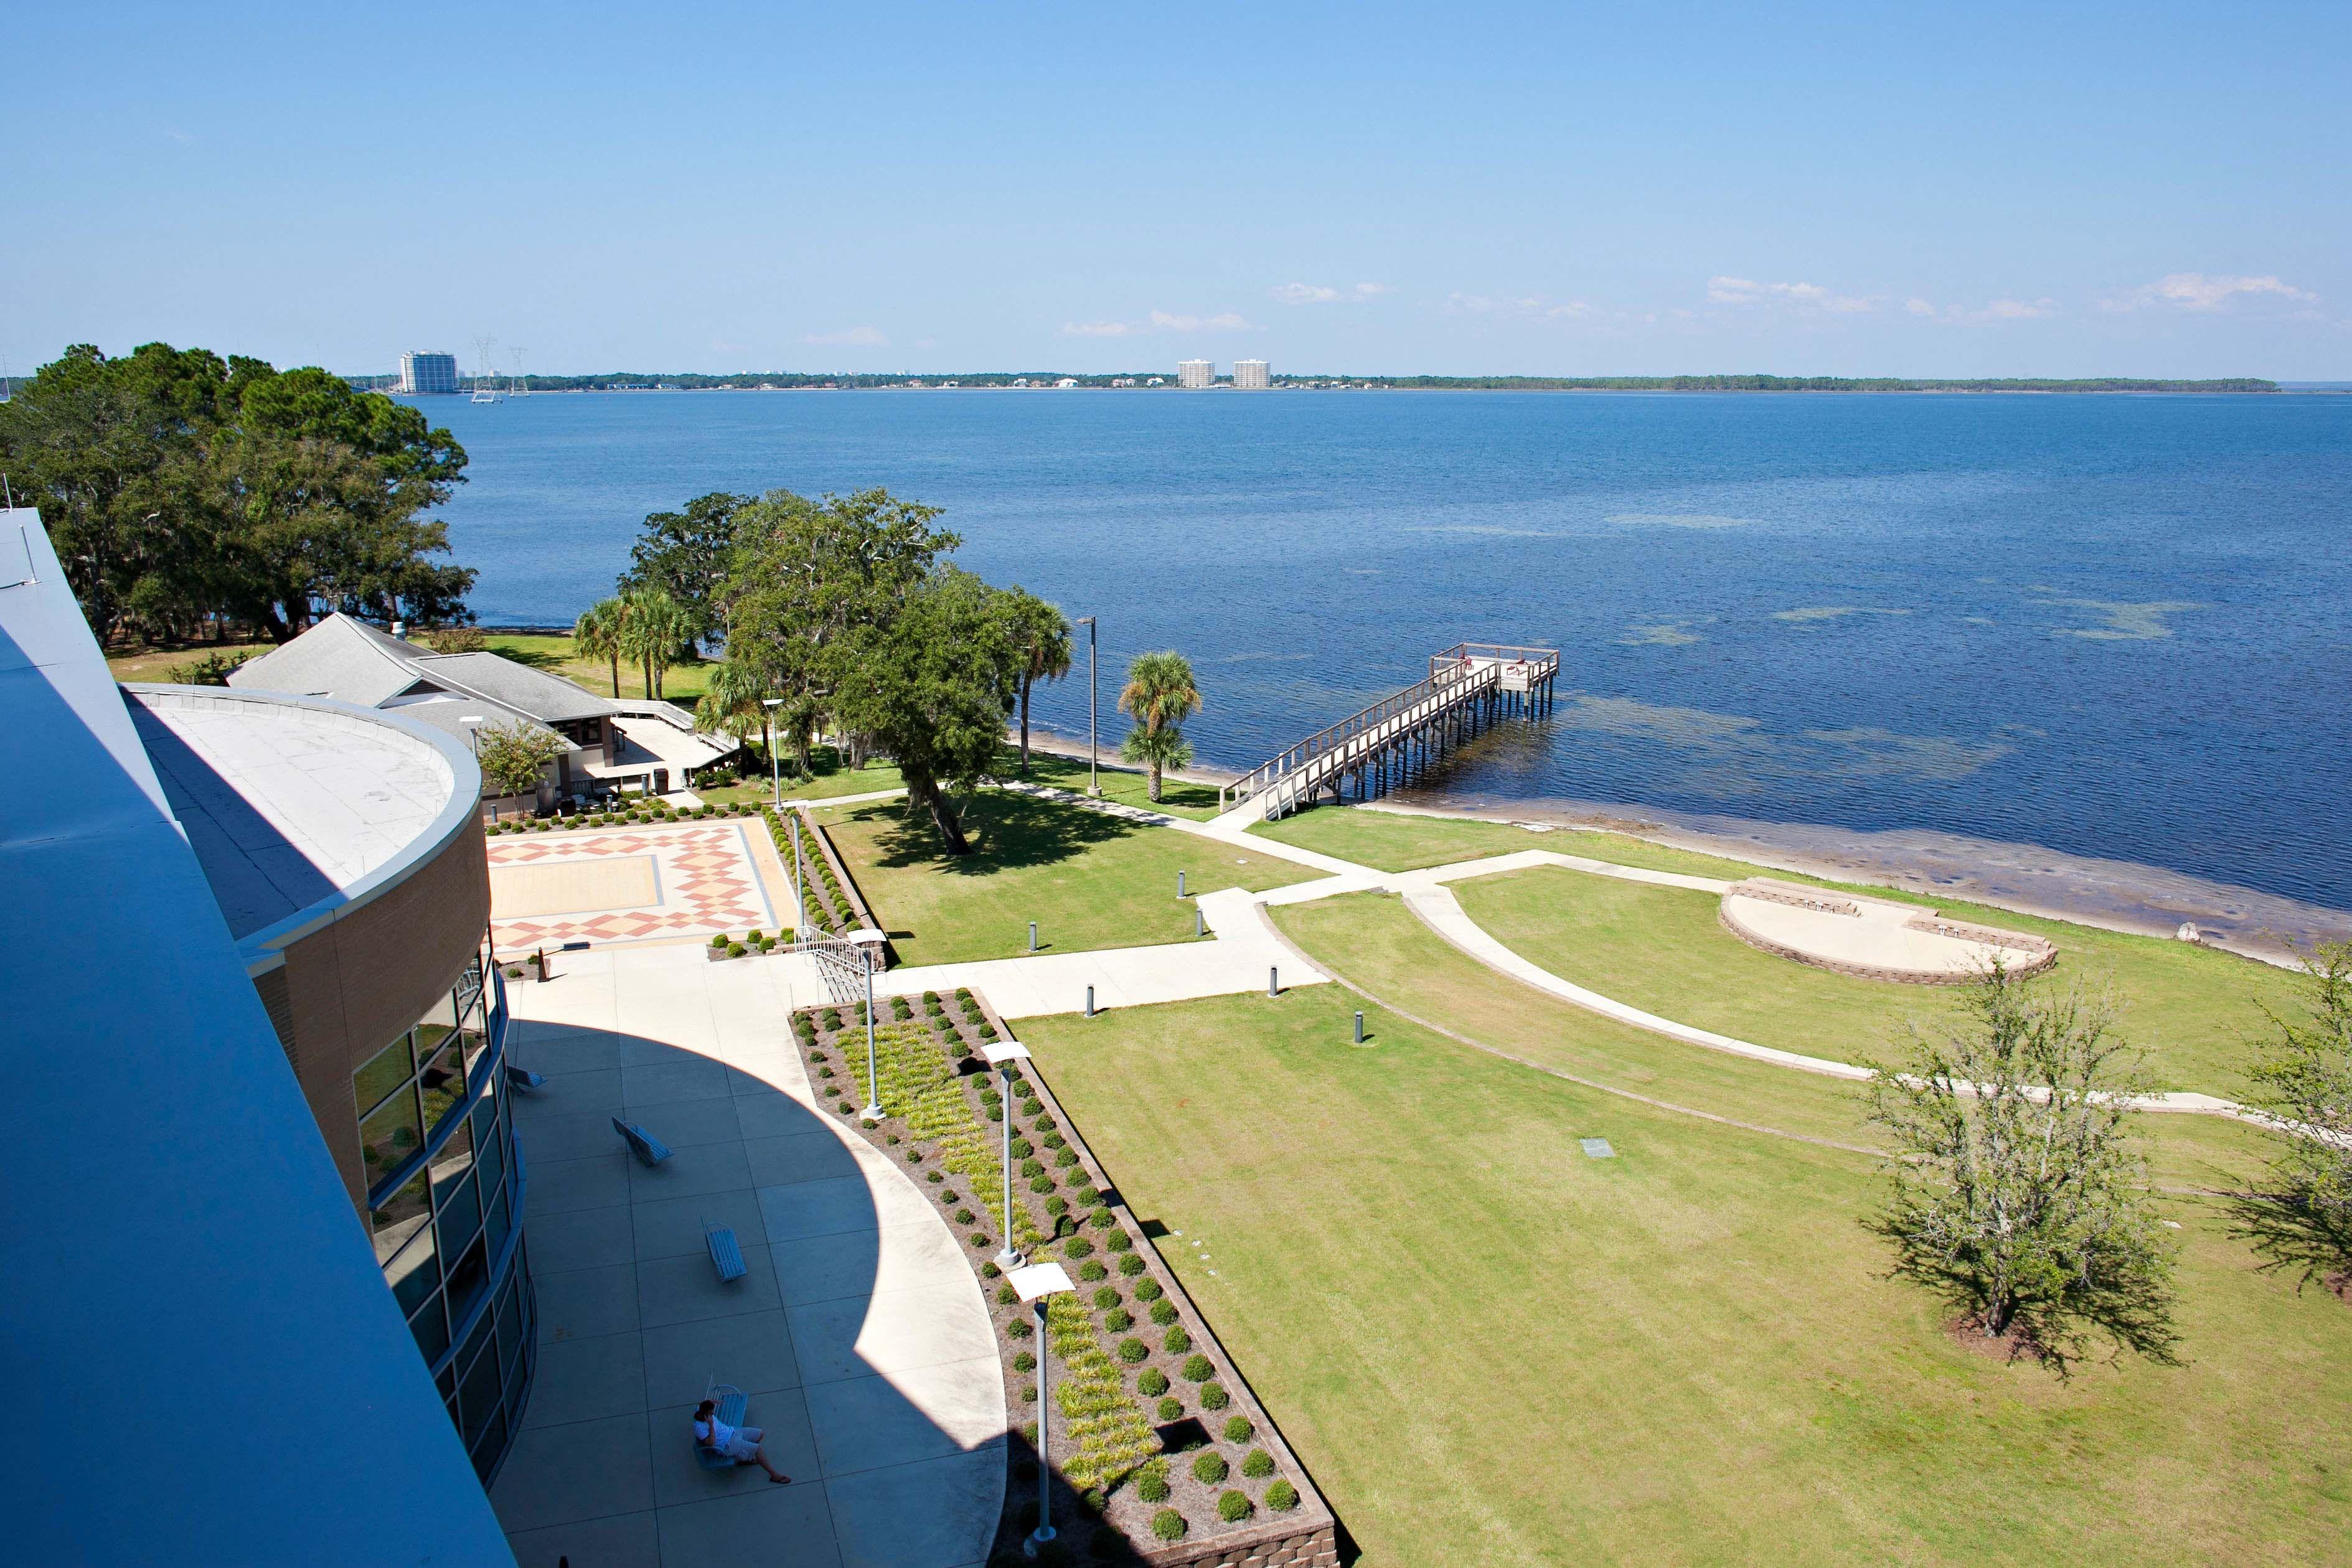 FSU Panama City is along North Bay in Panama City, Fla